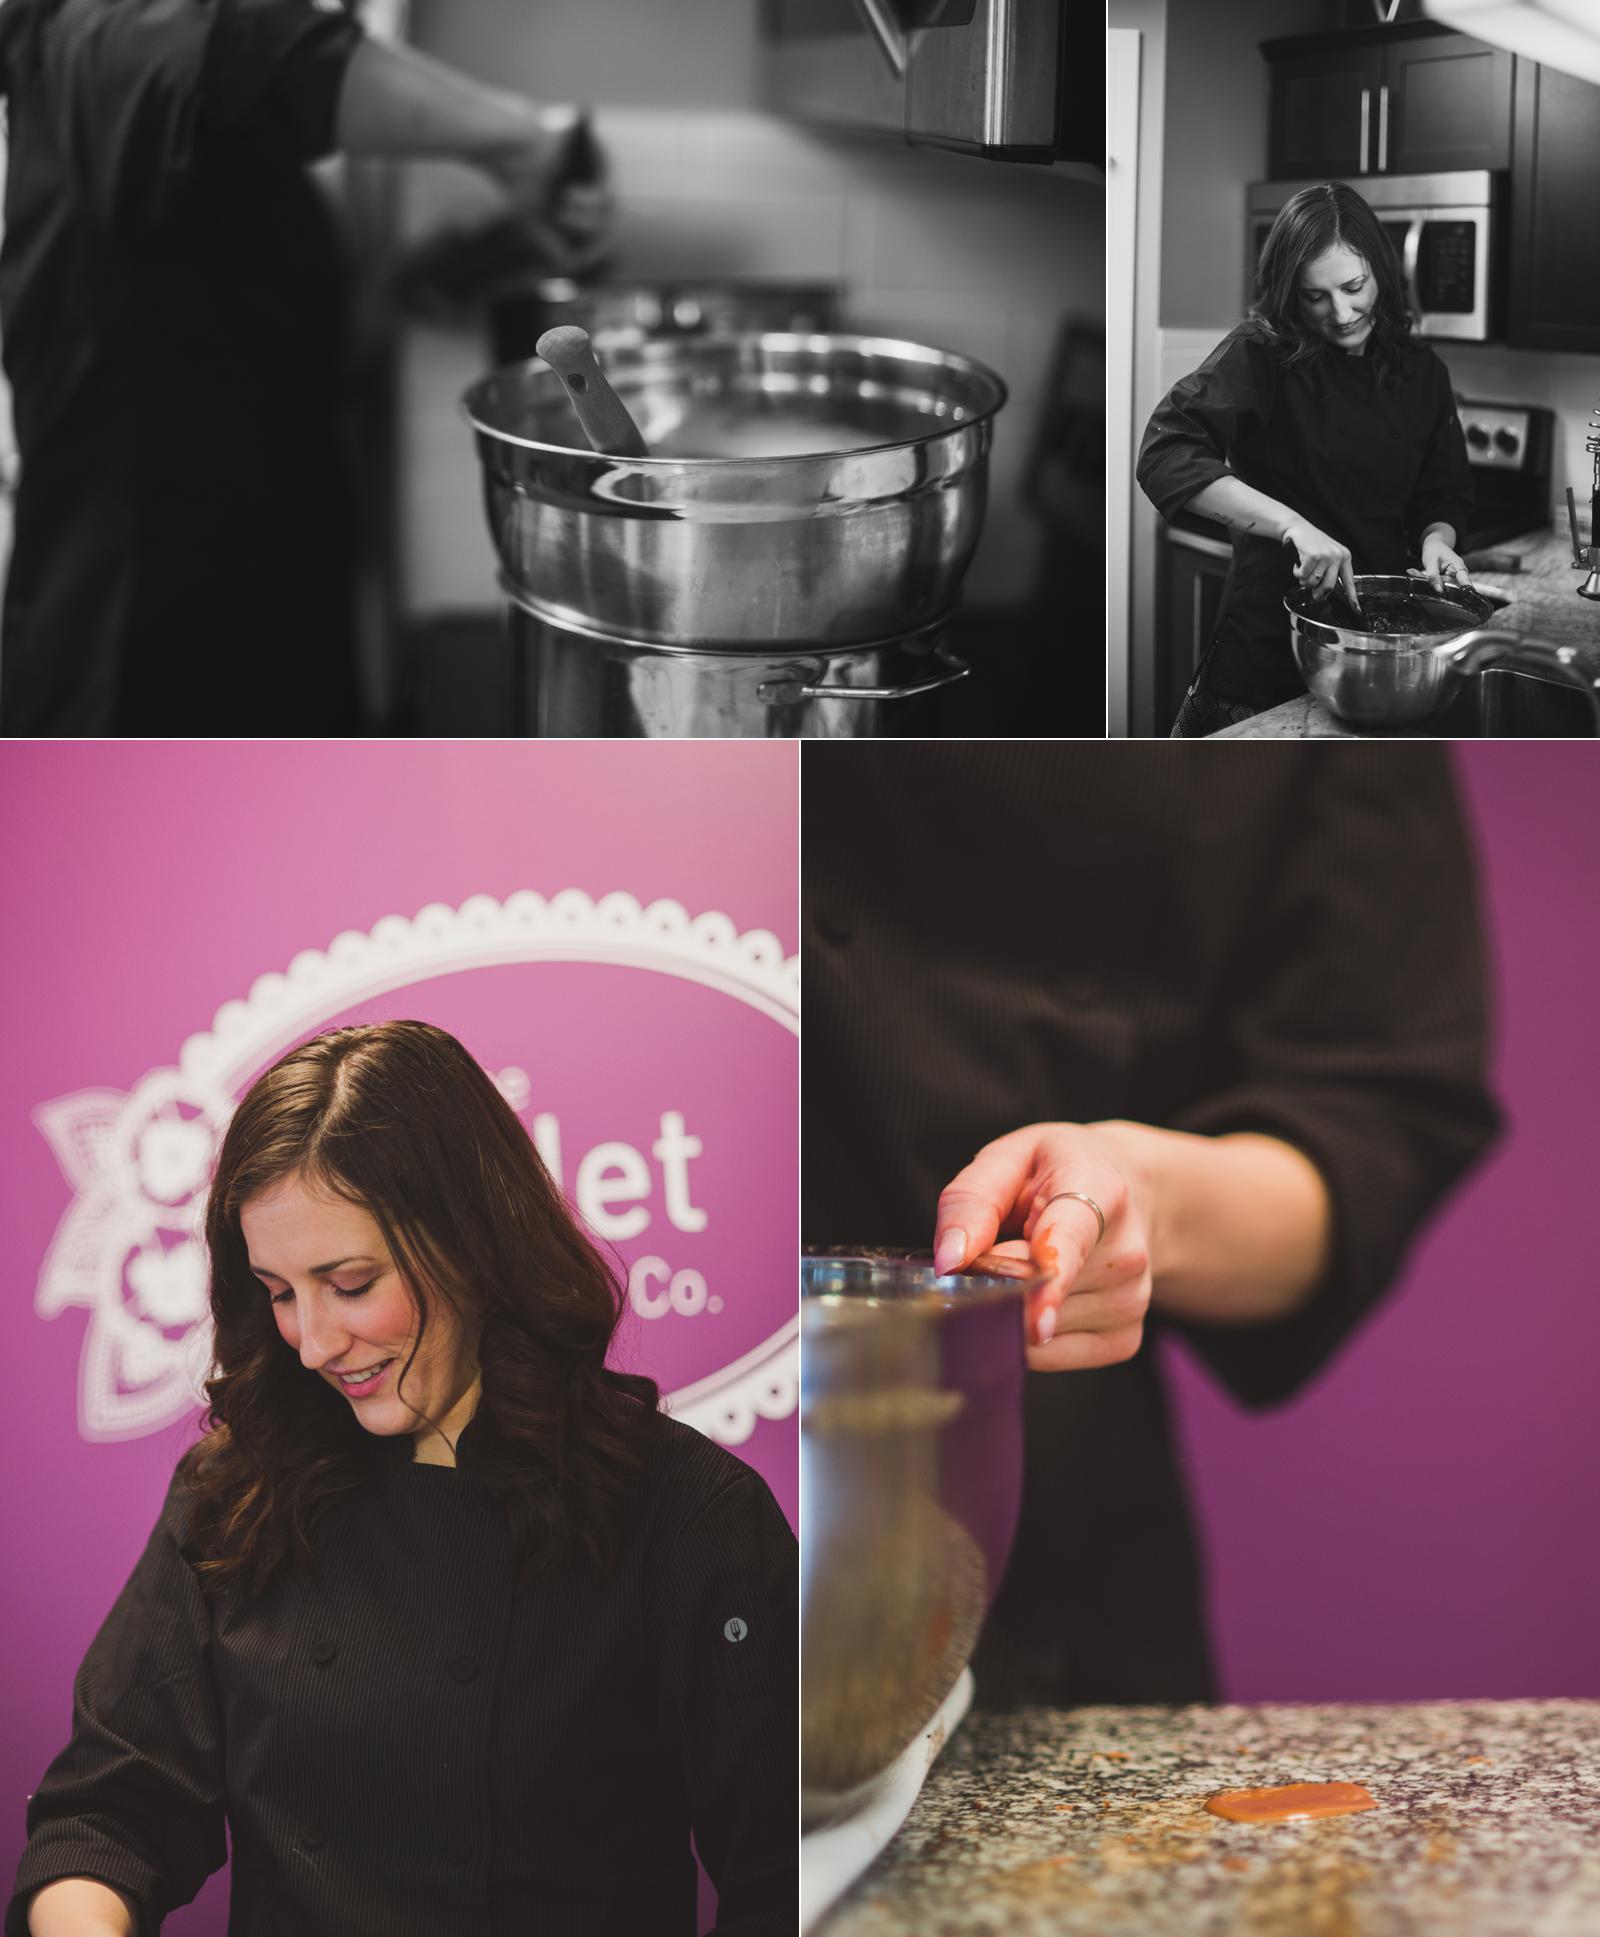 bbcollective_spotlight_yeg_blog_photography_violetchocolatecompany_rebeccagrant